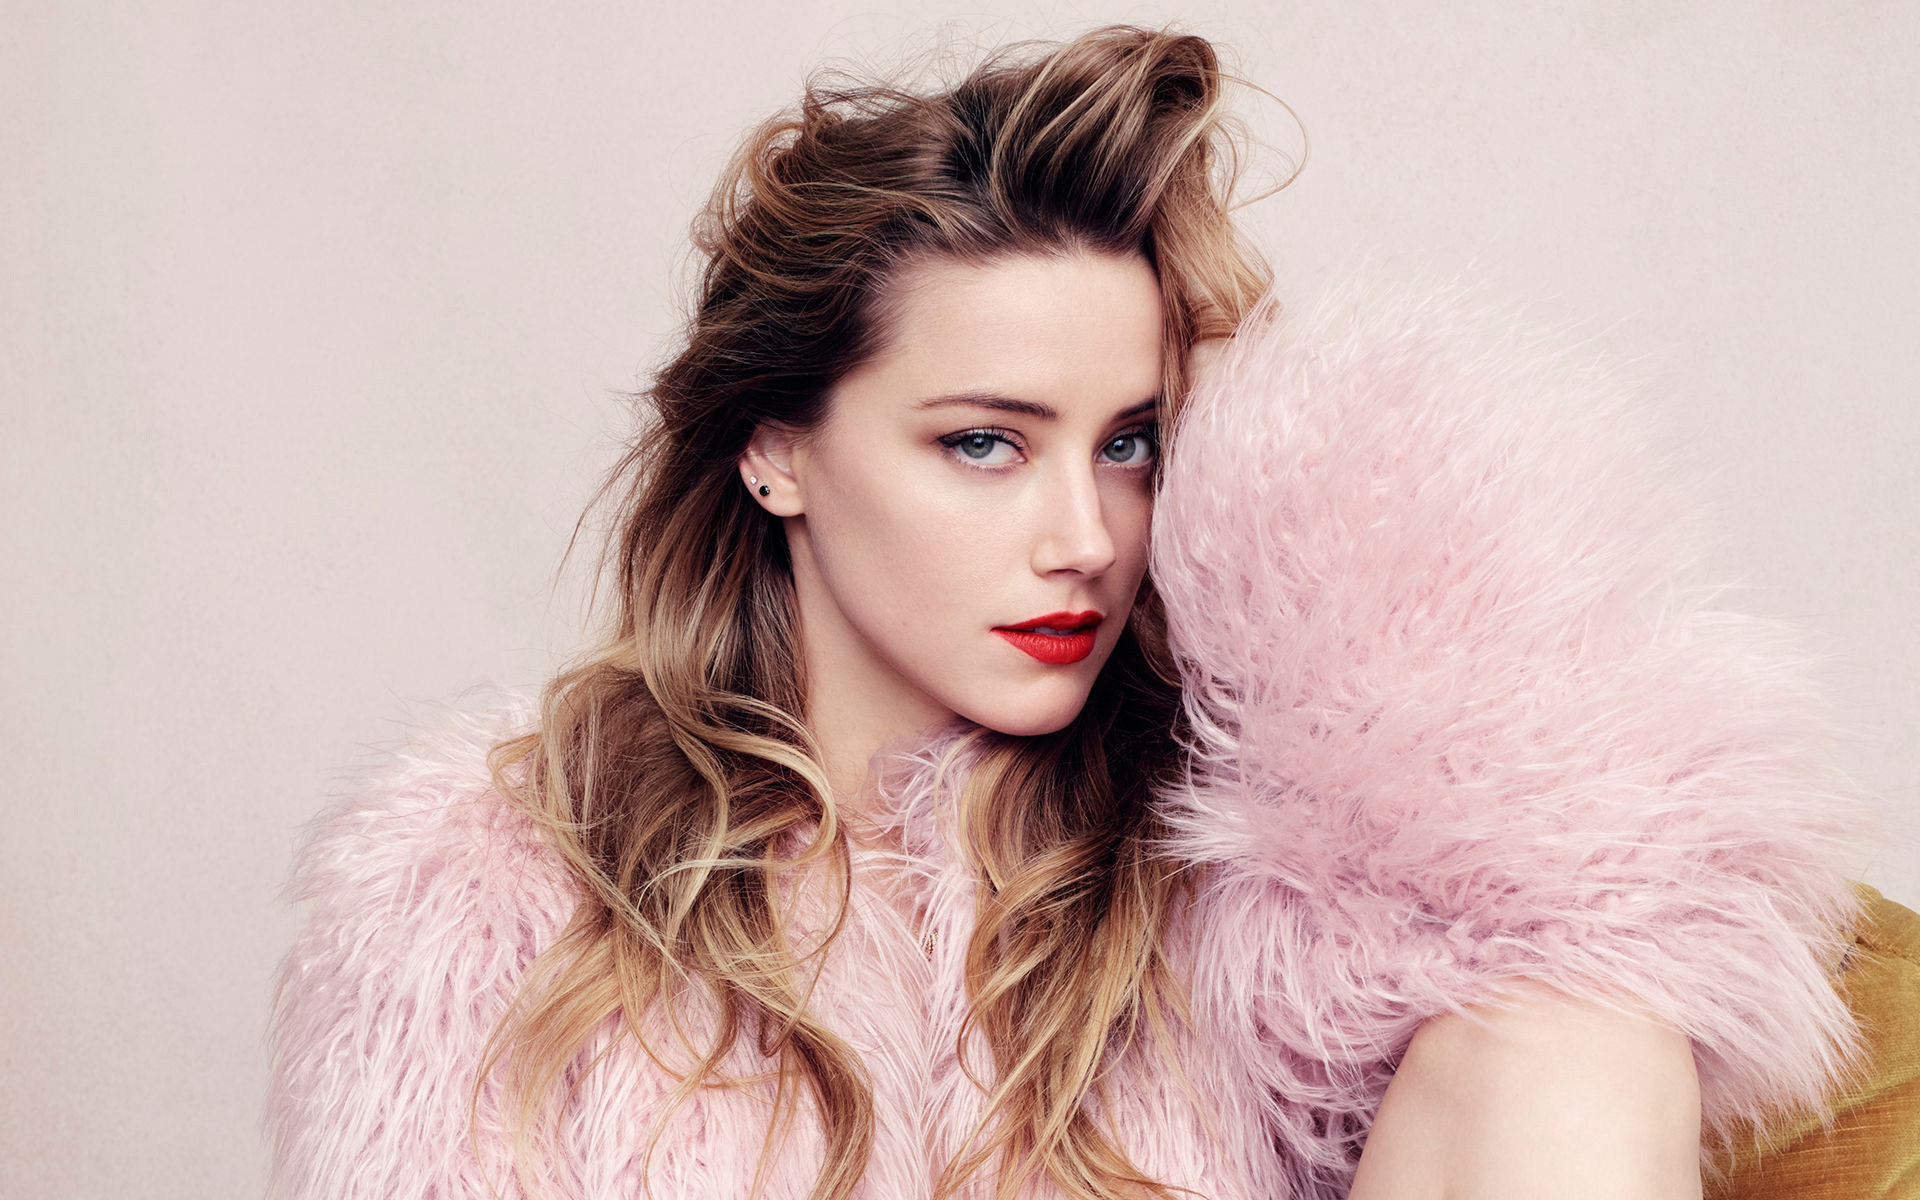 Res: 1920x1200, Pink Fur Amber Heard Wallpaper